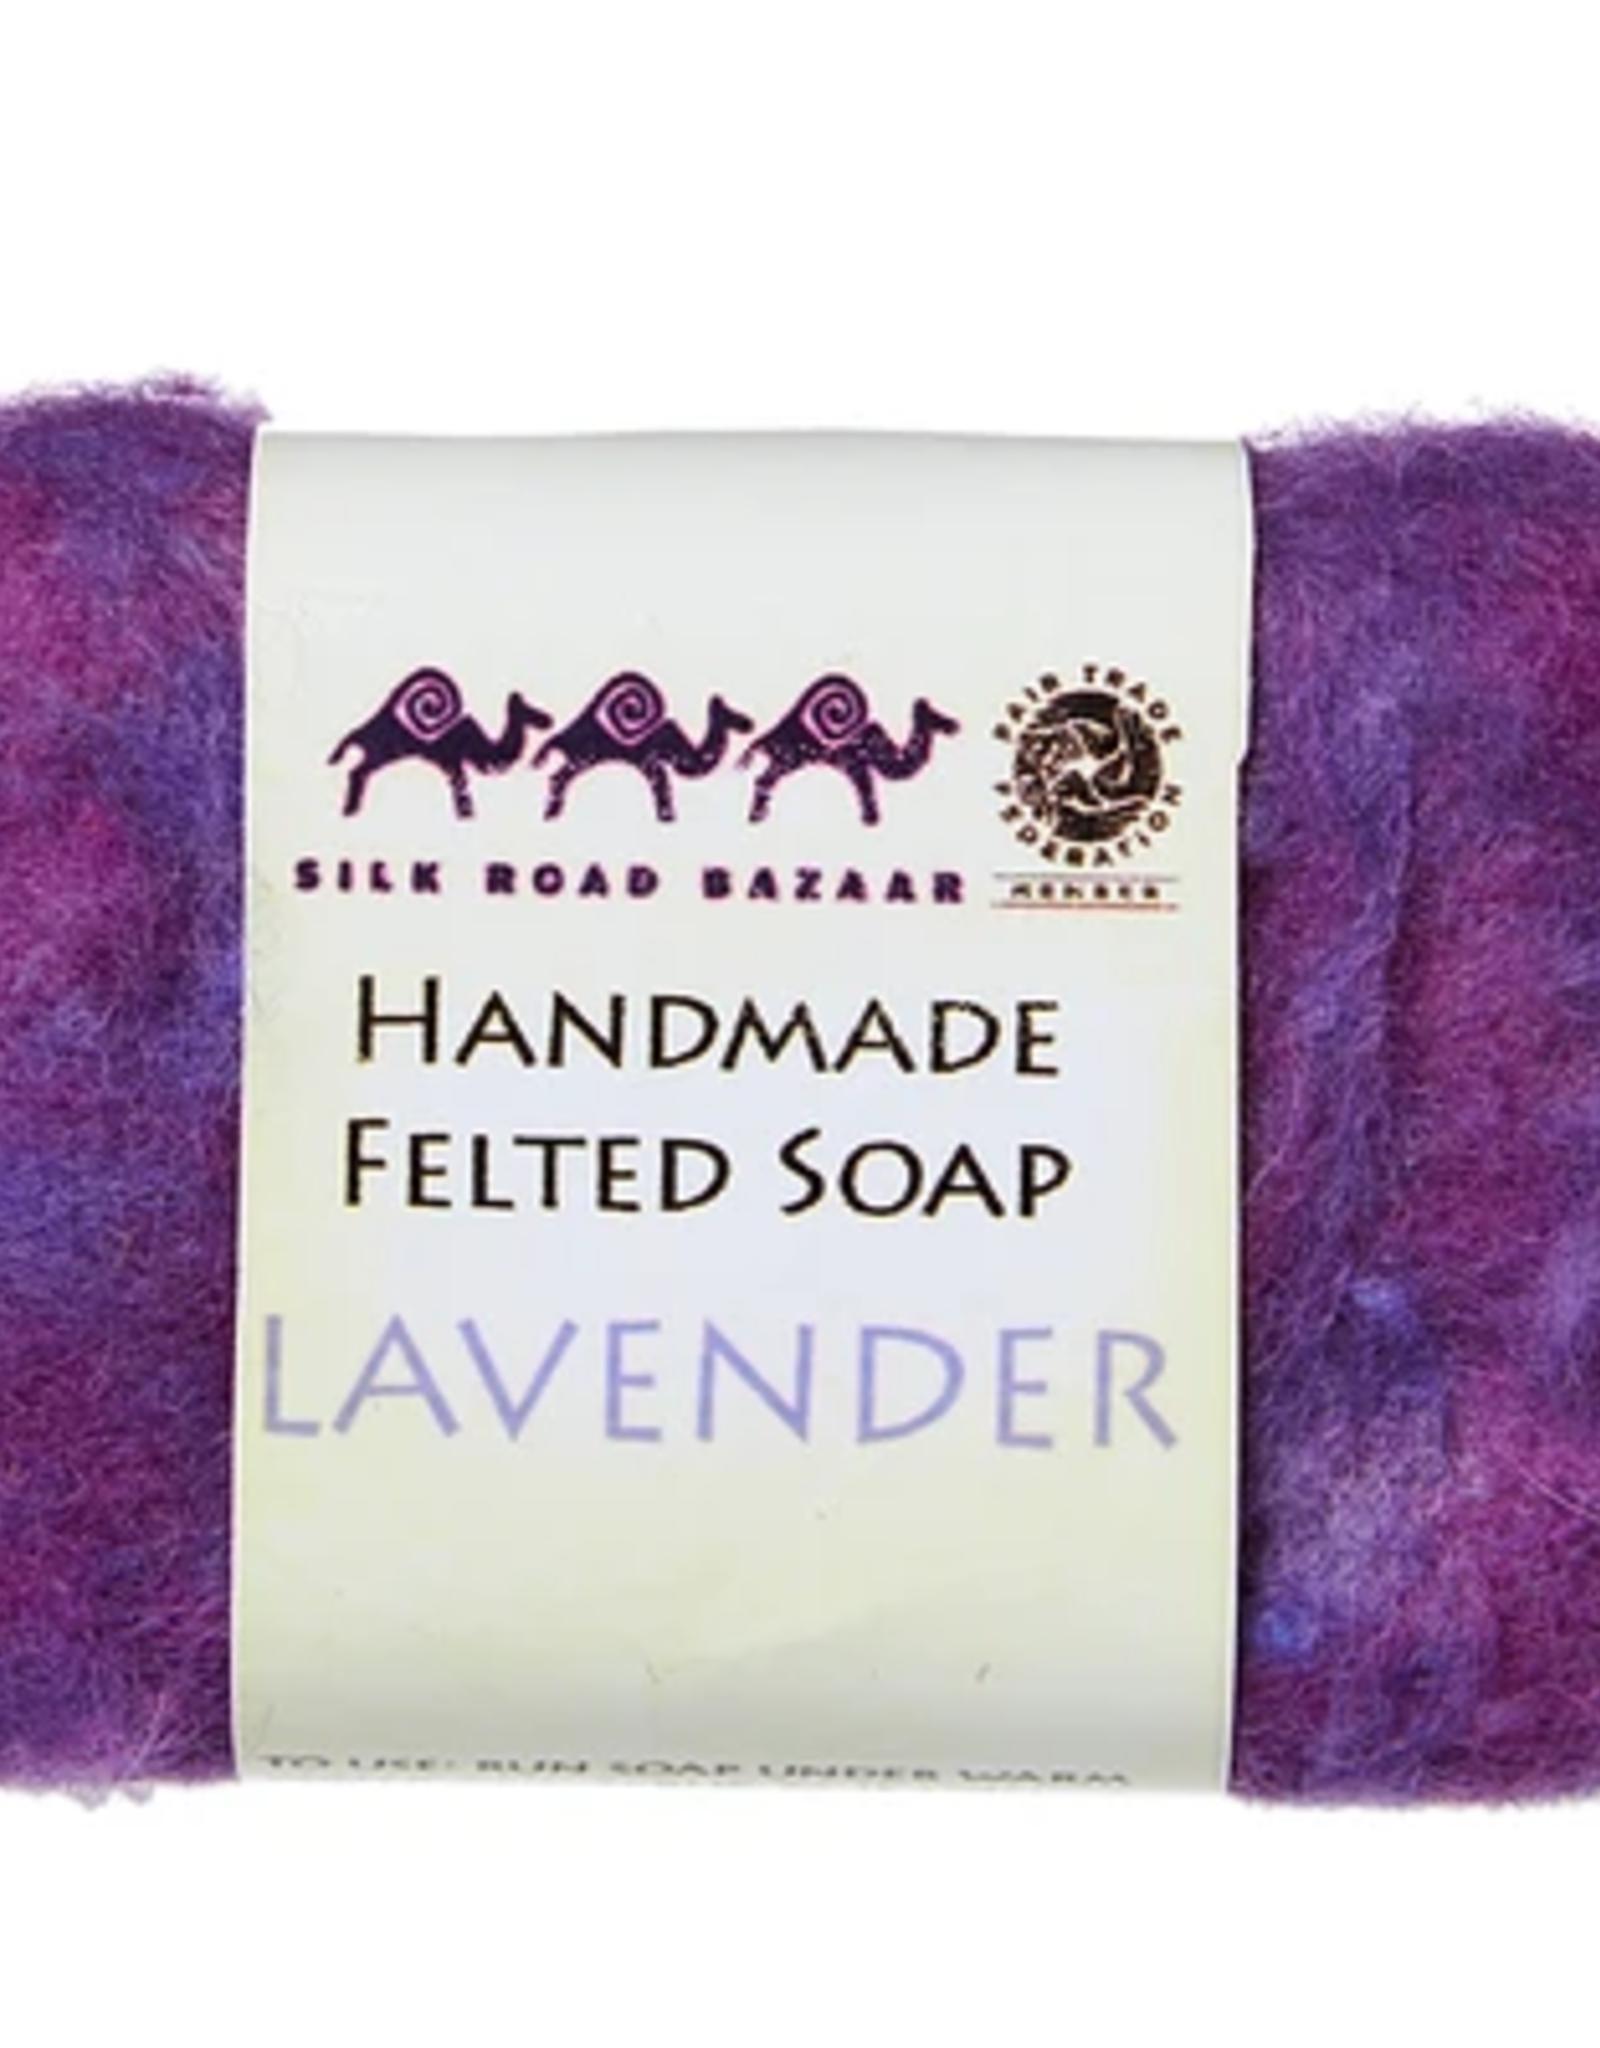 kyrgyzstan, Felted Soap Lavender